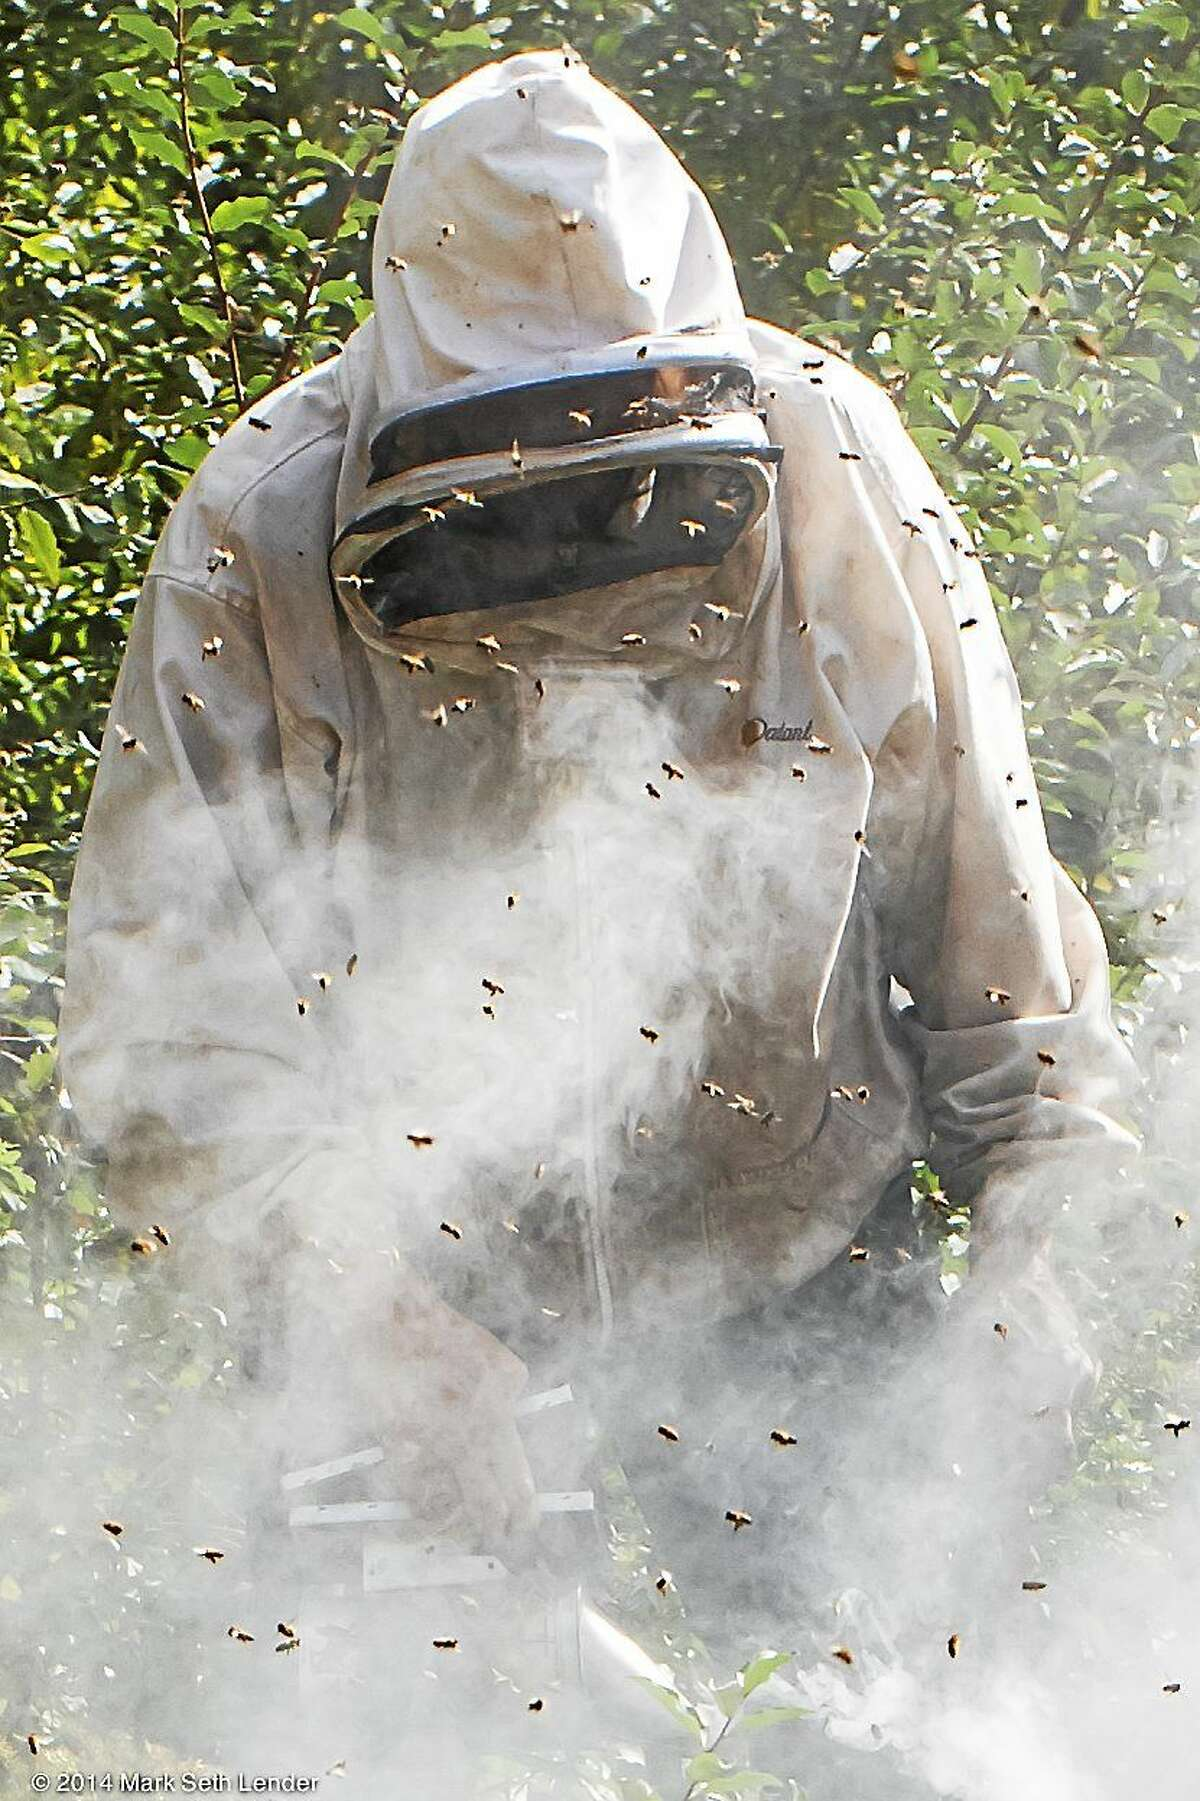 Jim Clinton calming an angry hive with smoke.